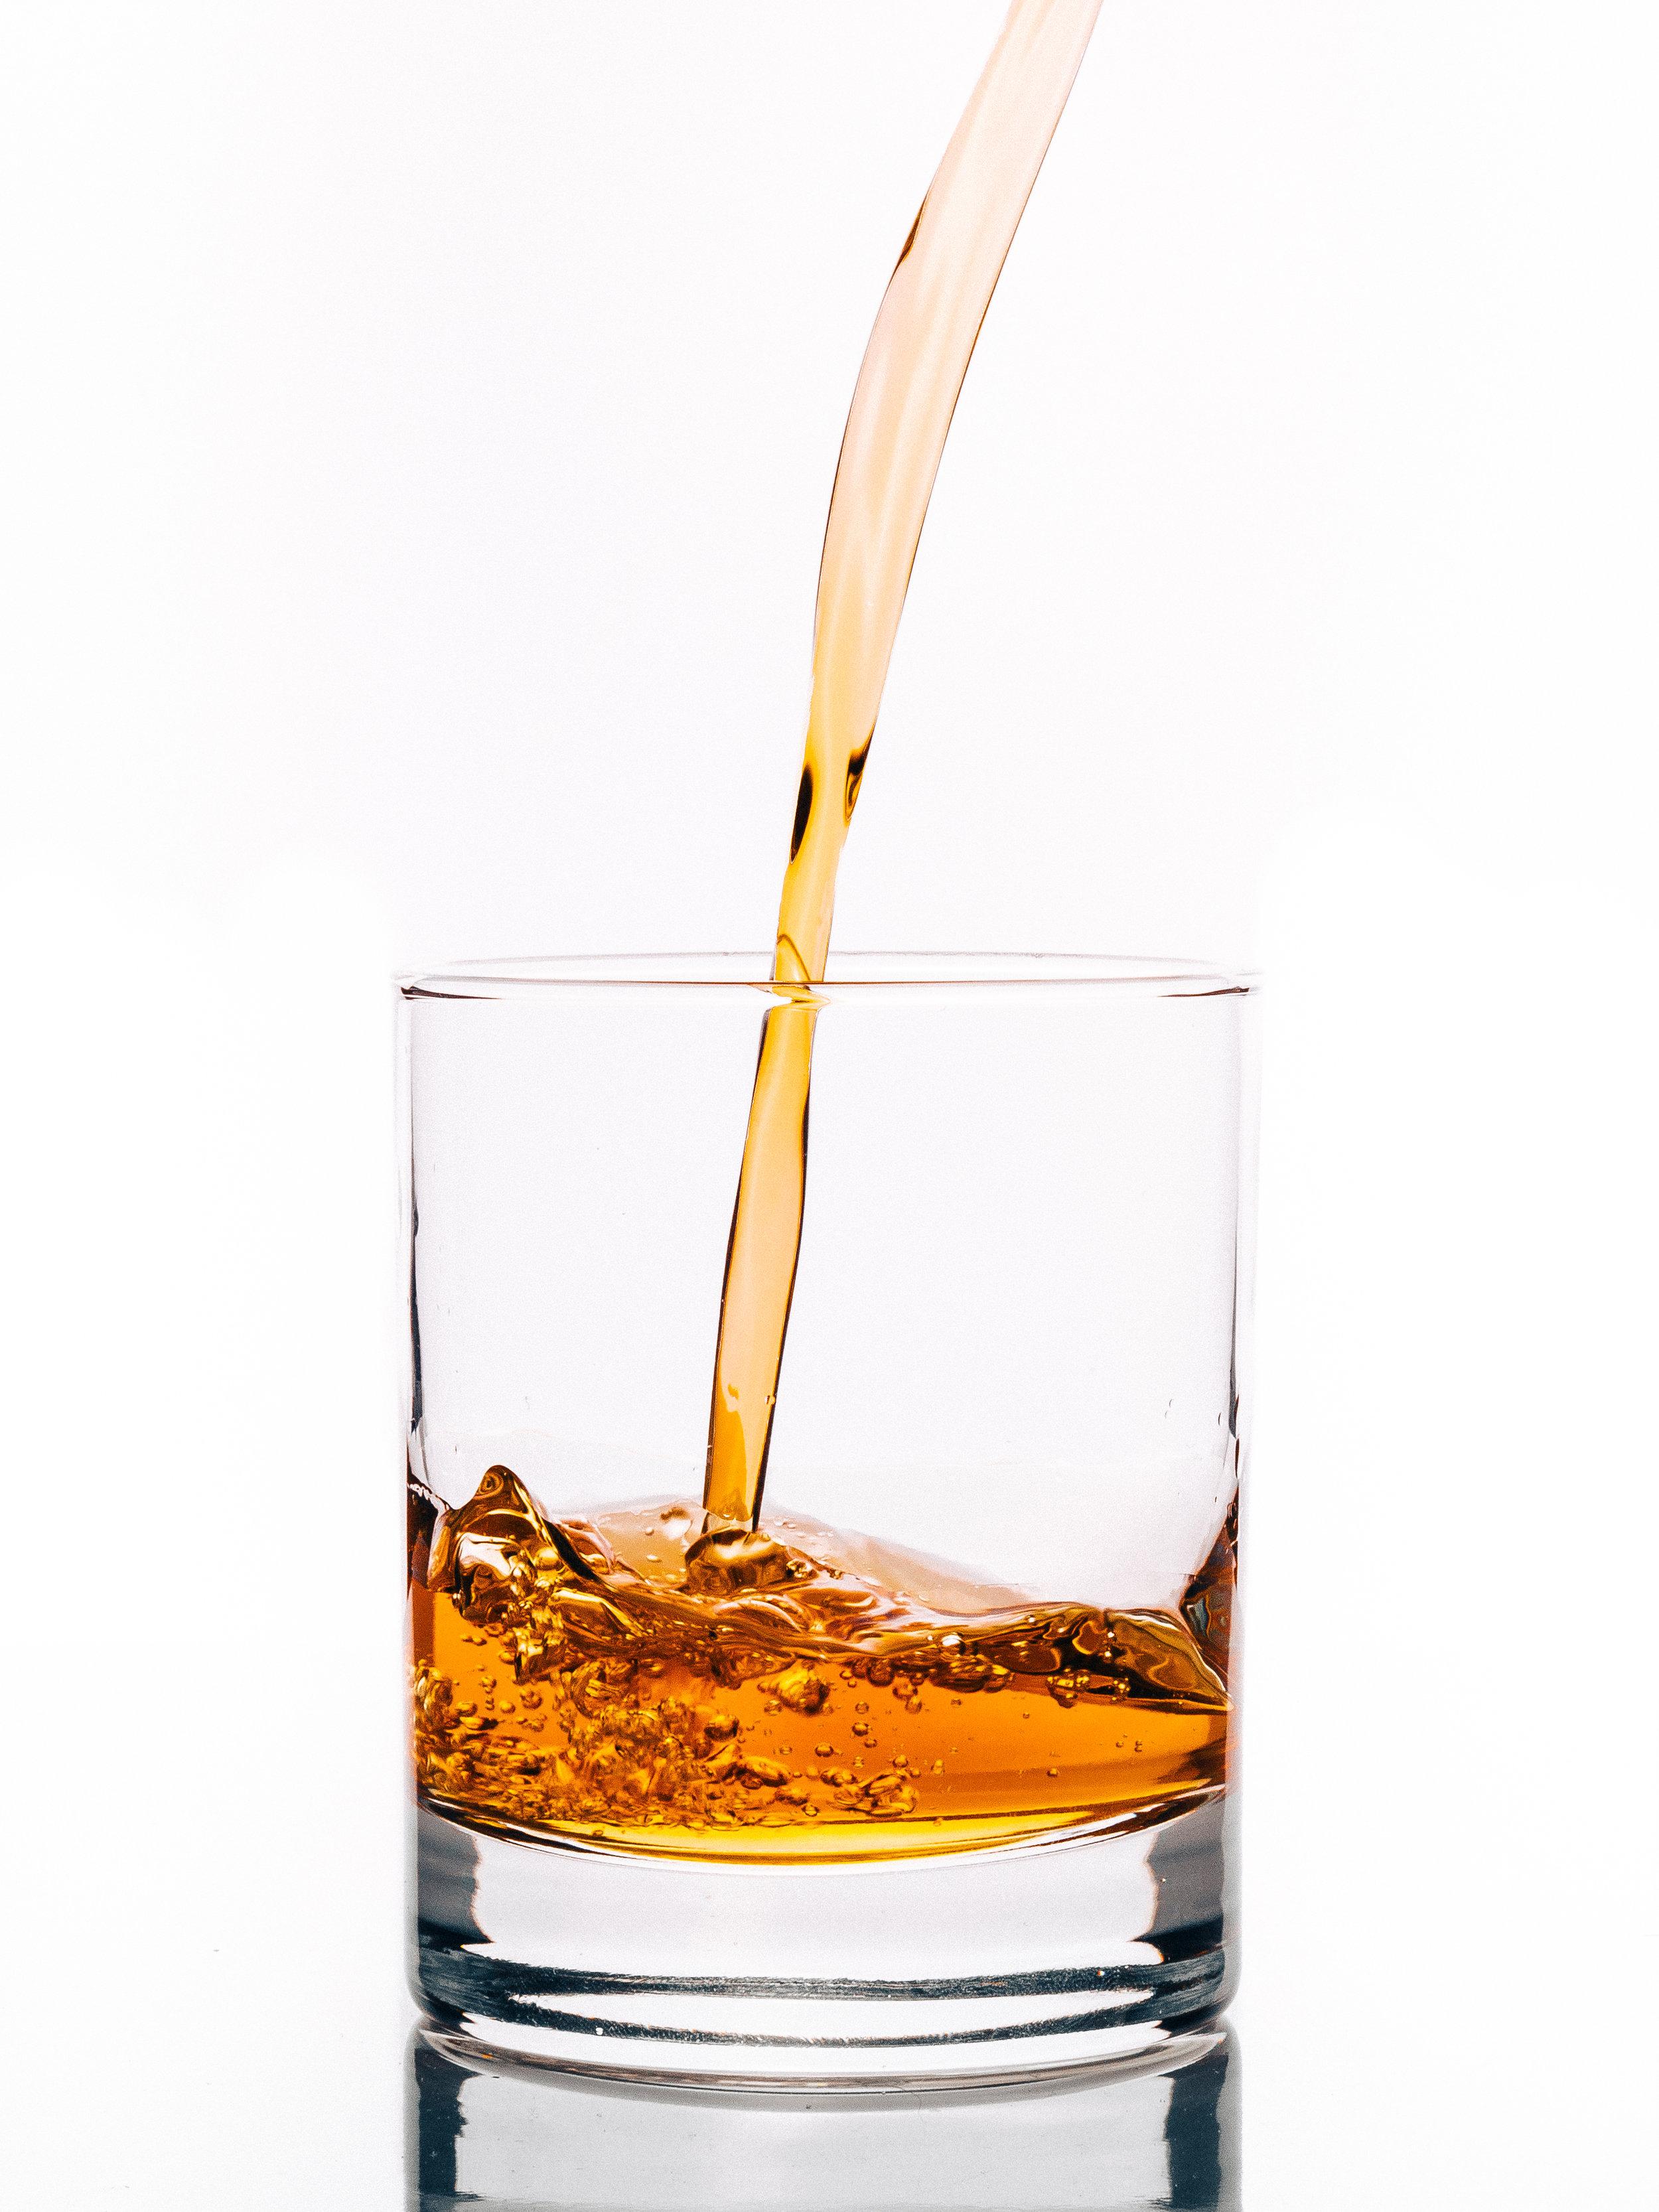 Liquor being poured into a glass.